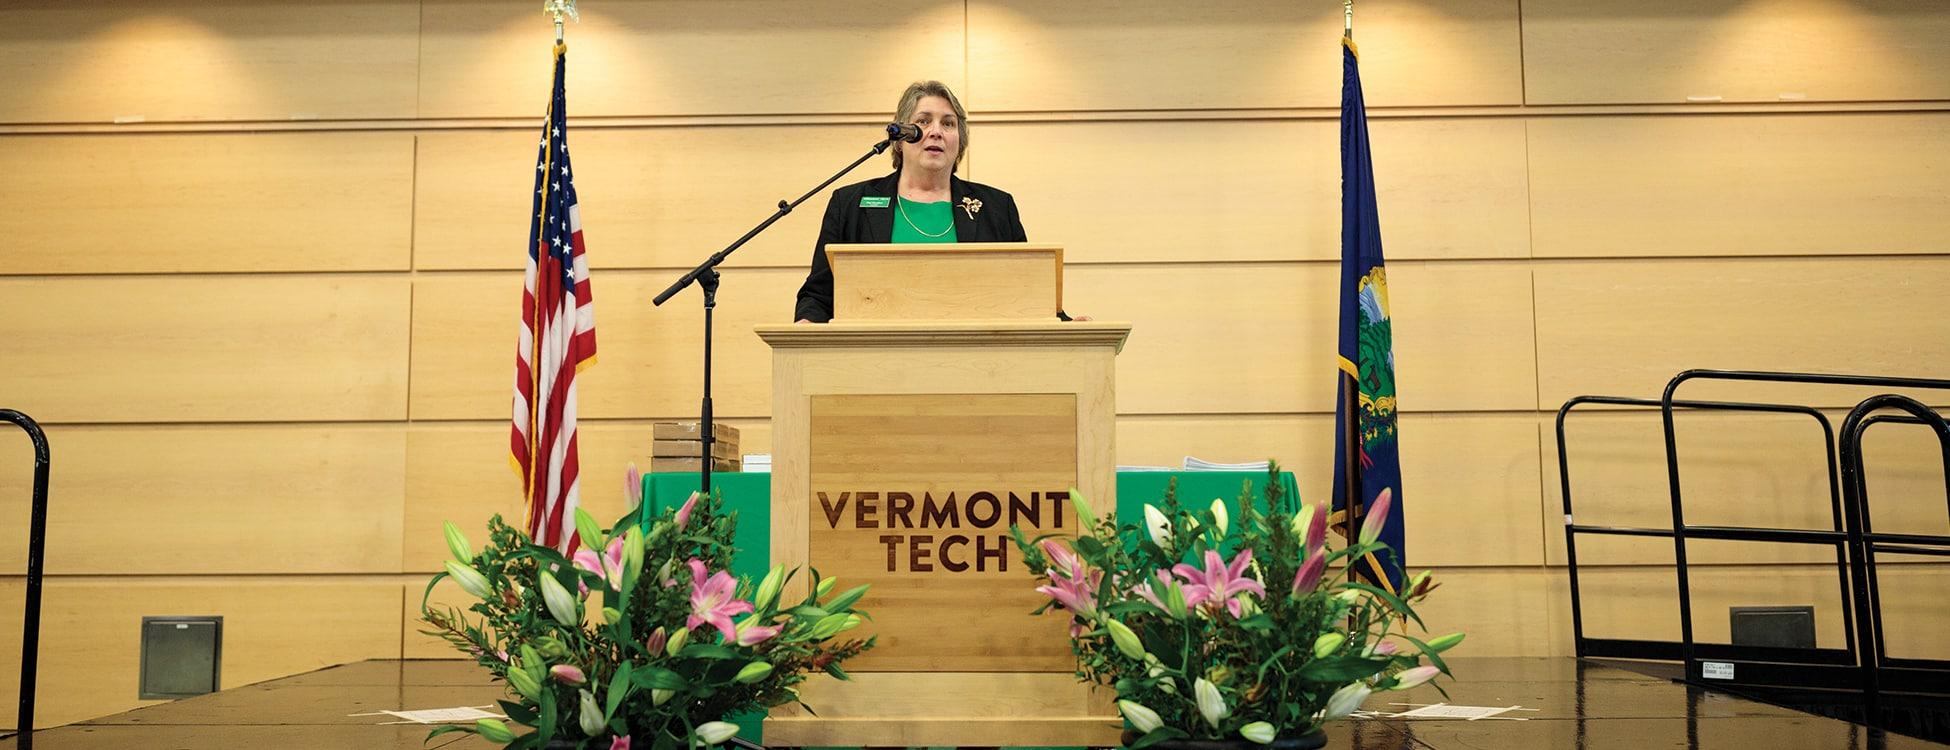 President Pat Moulton speaks at podium